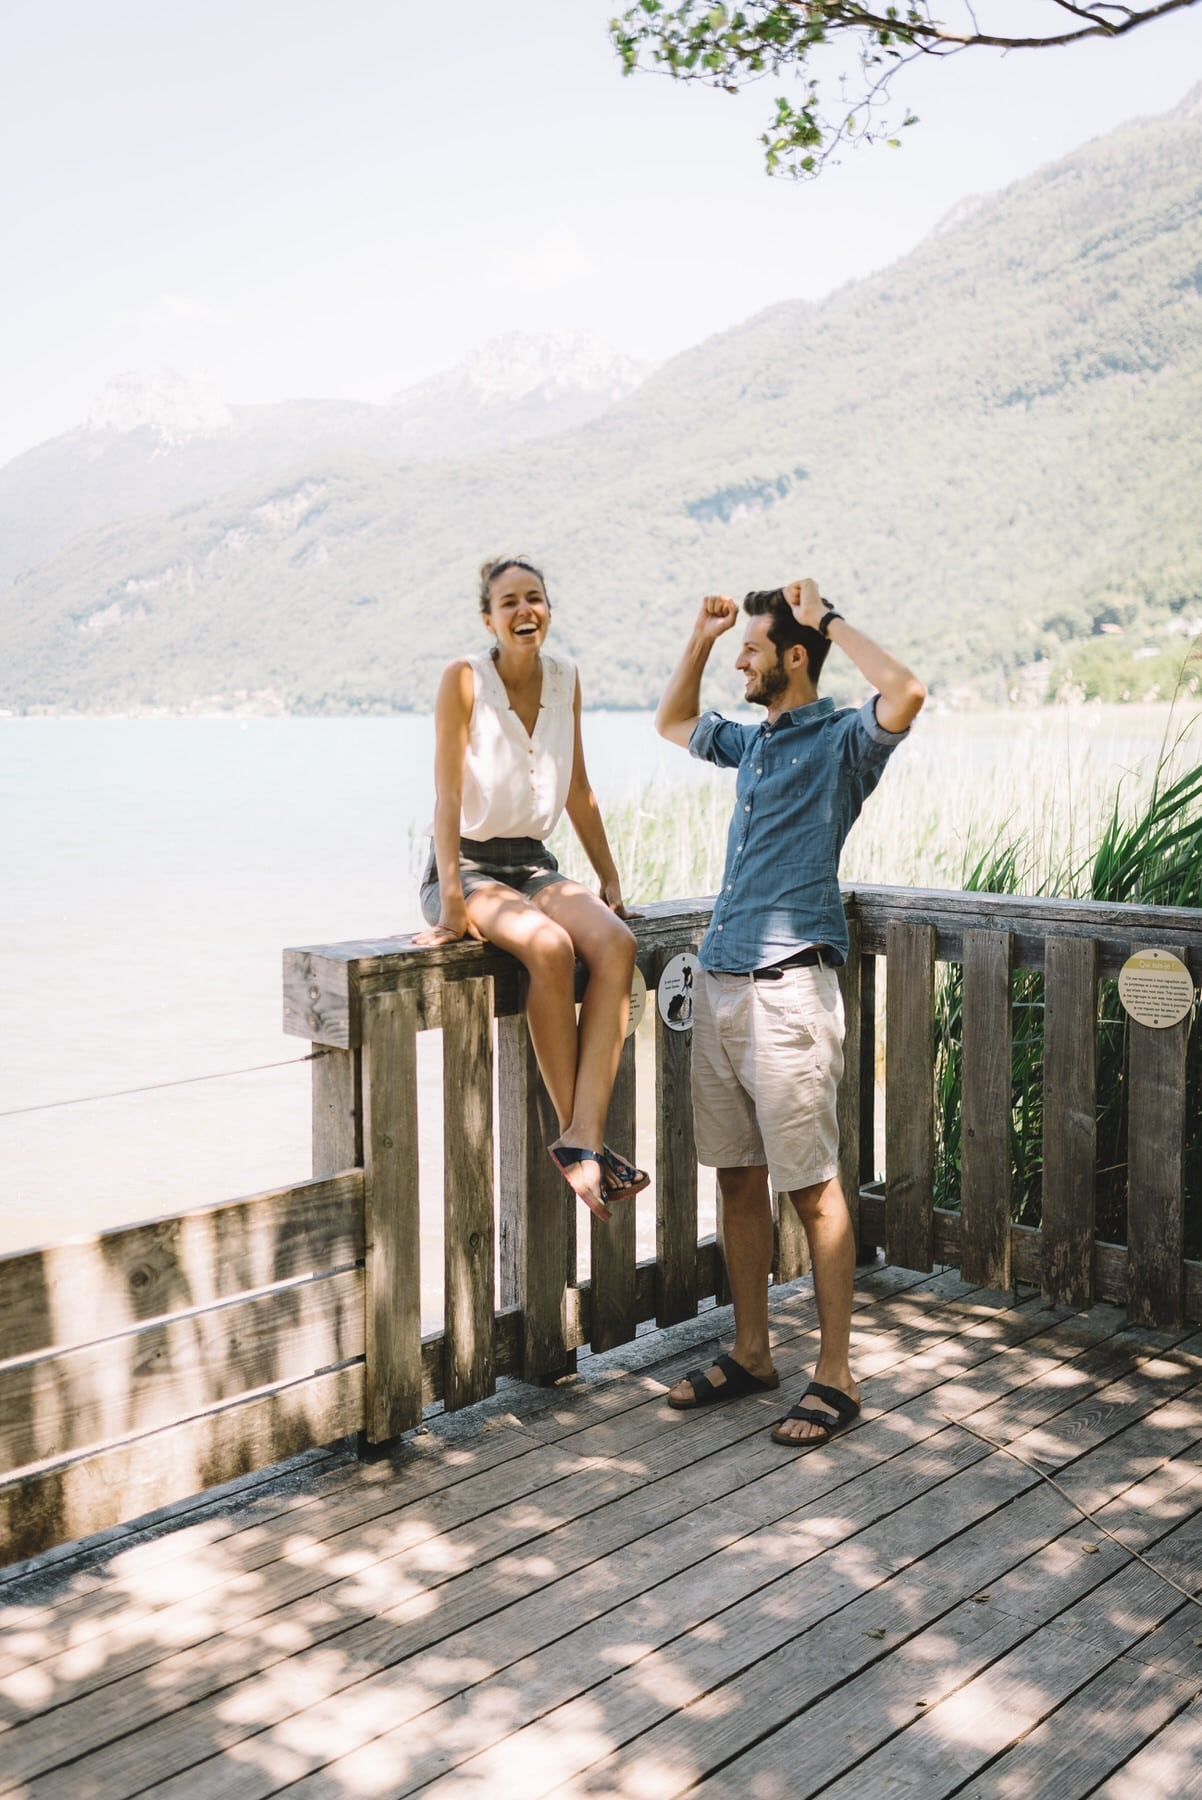 Photographe seance couple paris annecy geneve